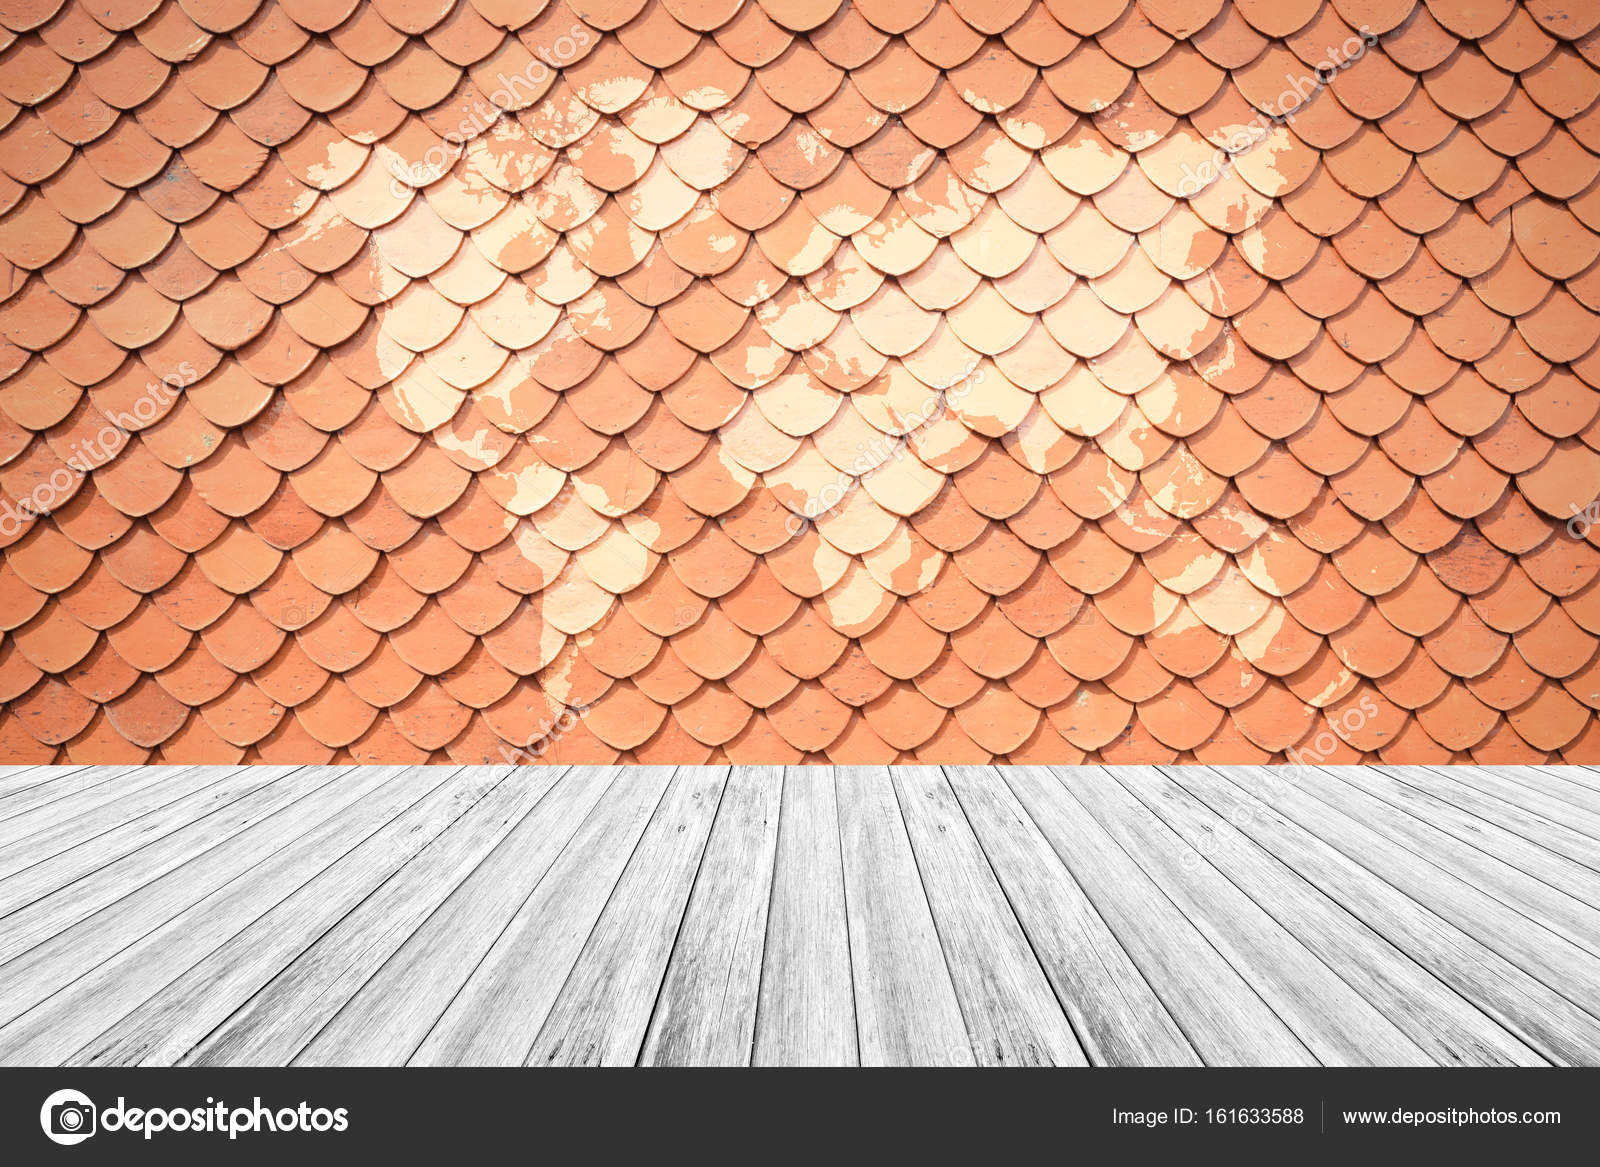 Textura De Techo De Teja Foto De Stock Pongmoji 161633588